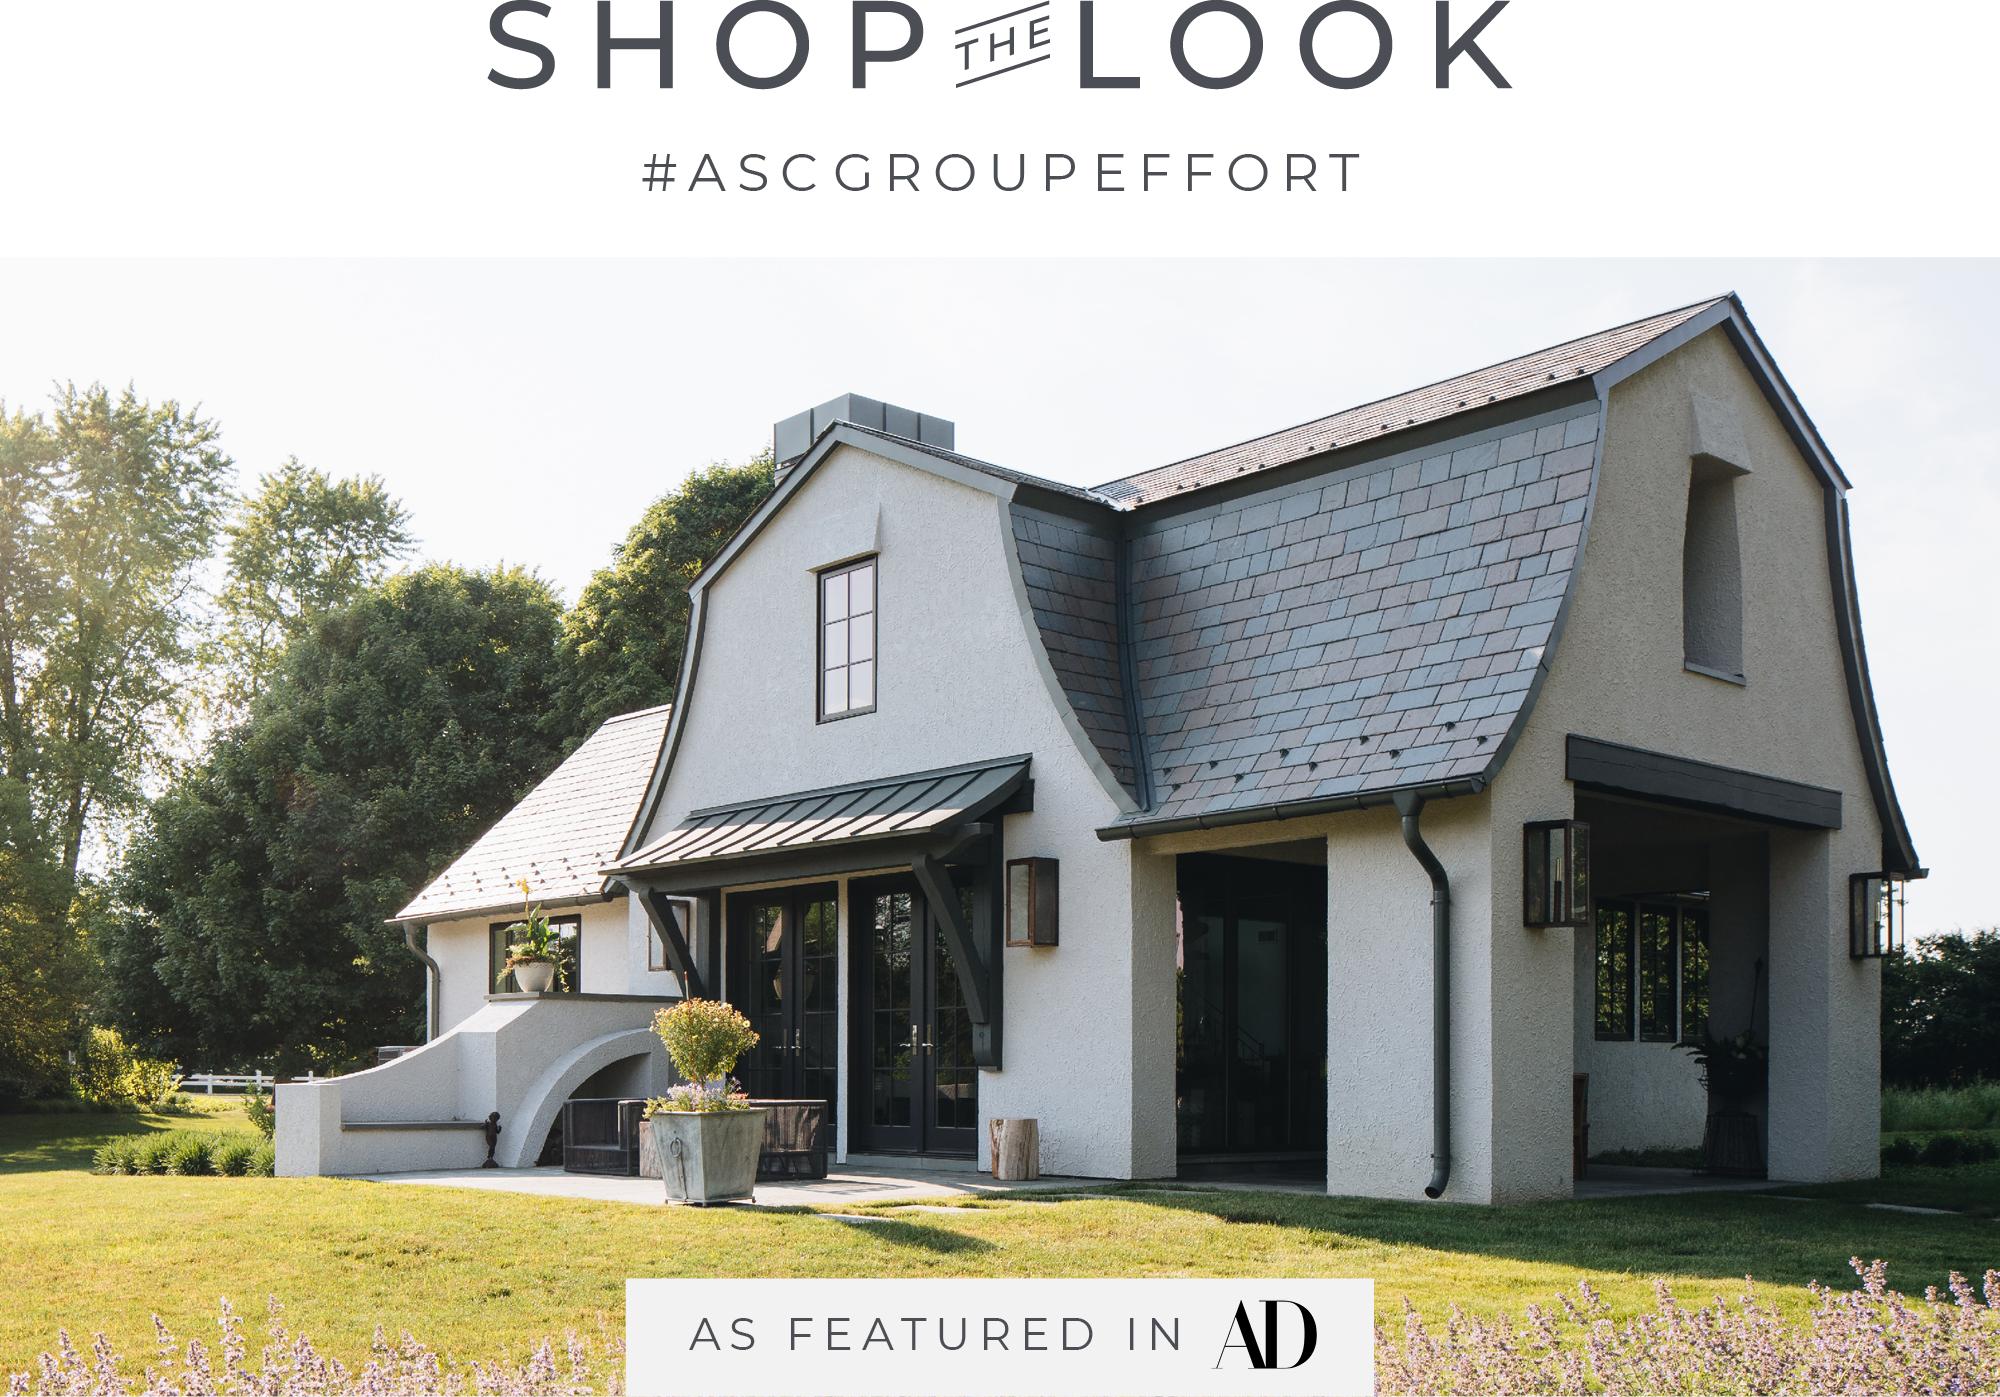 Shop The Look: Group Effort